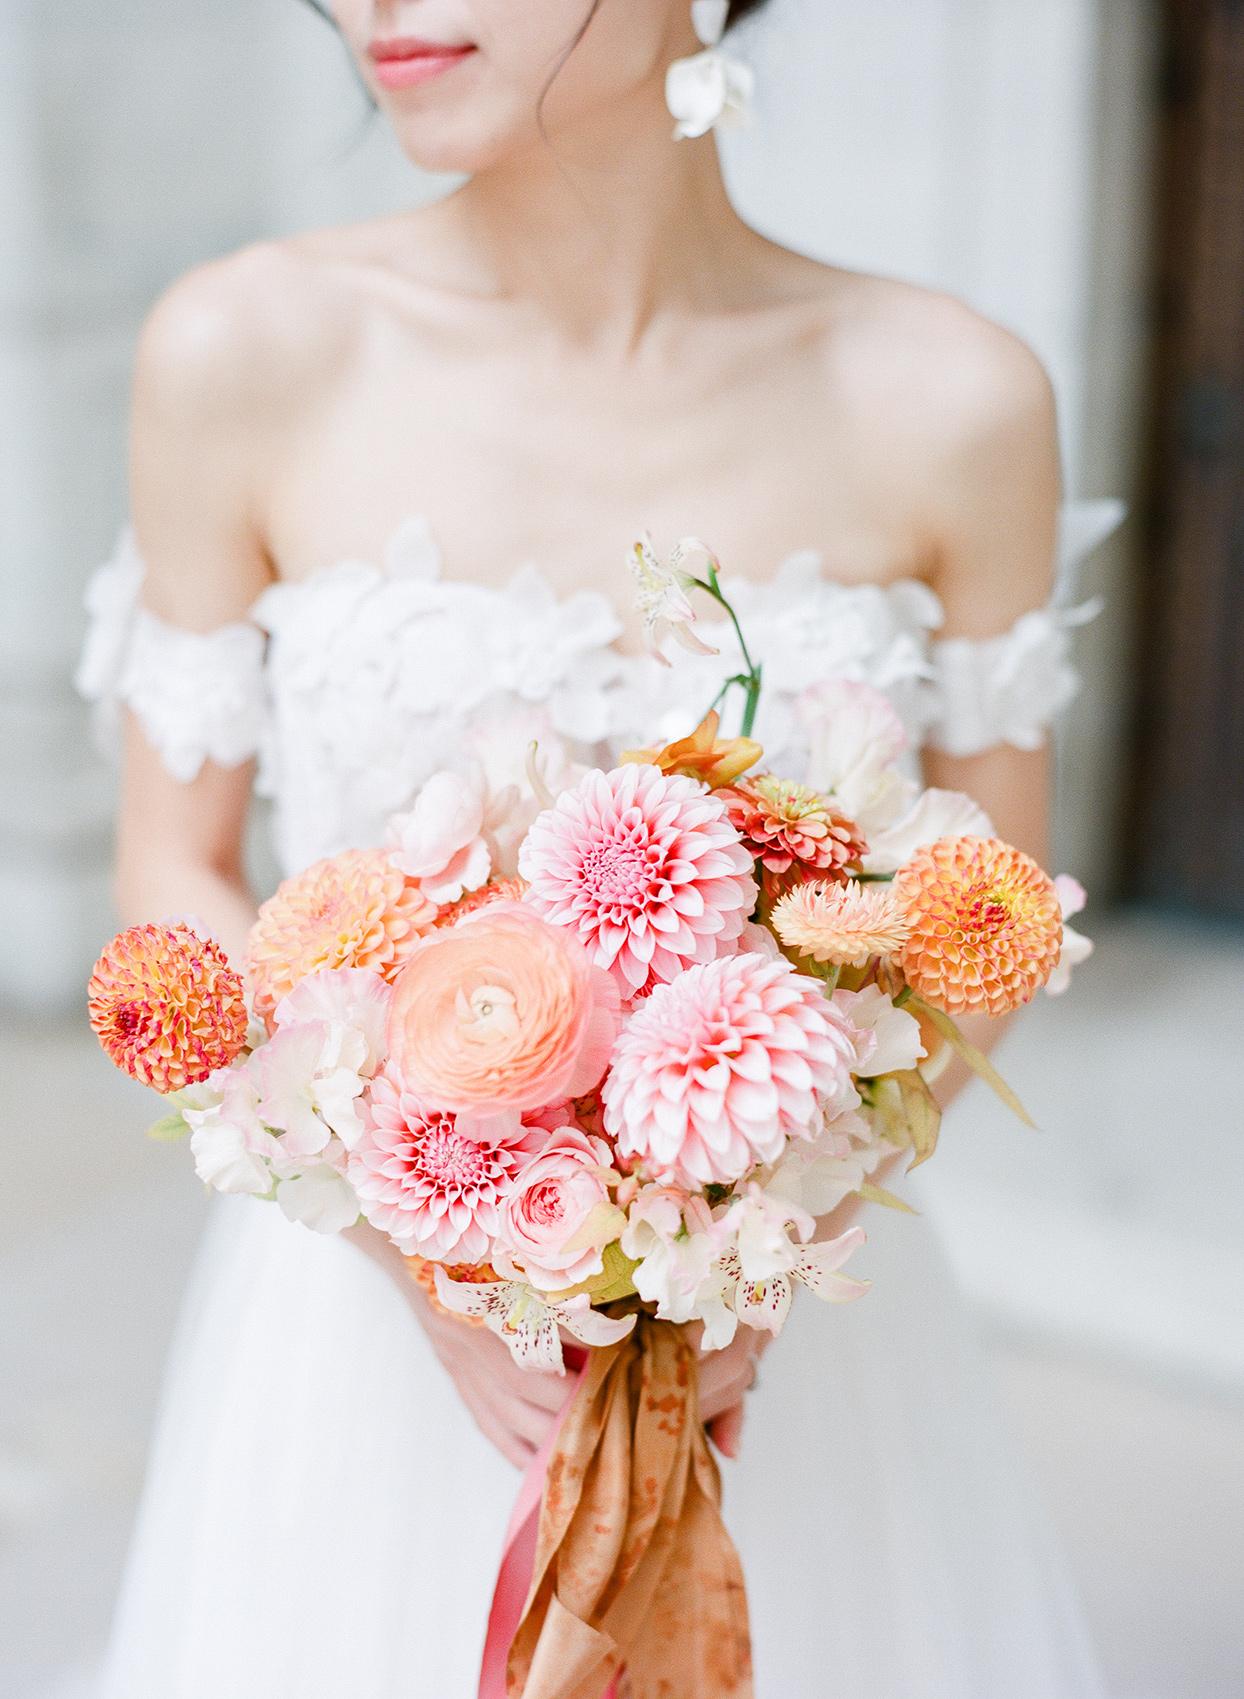 pastel pink and orange floral bouquet in bride's hands